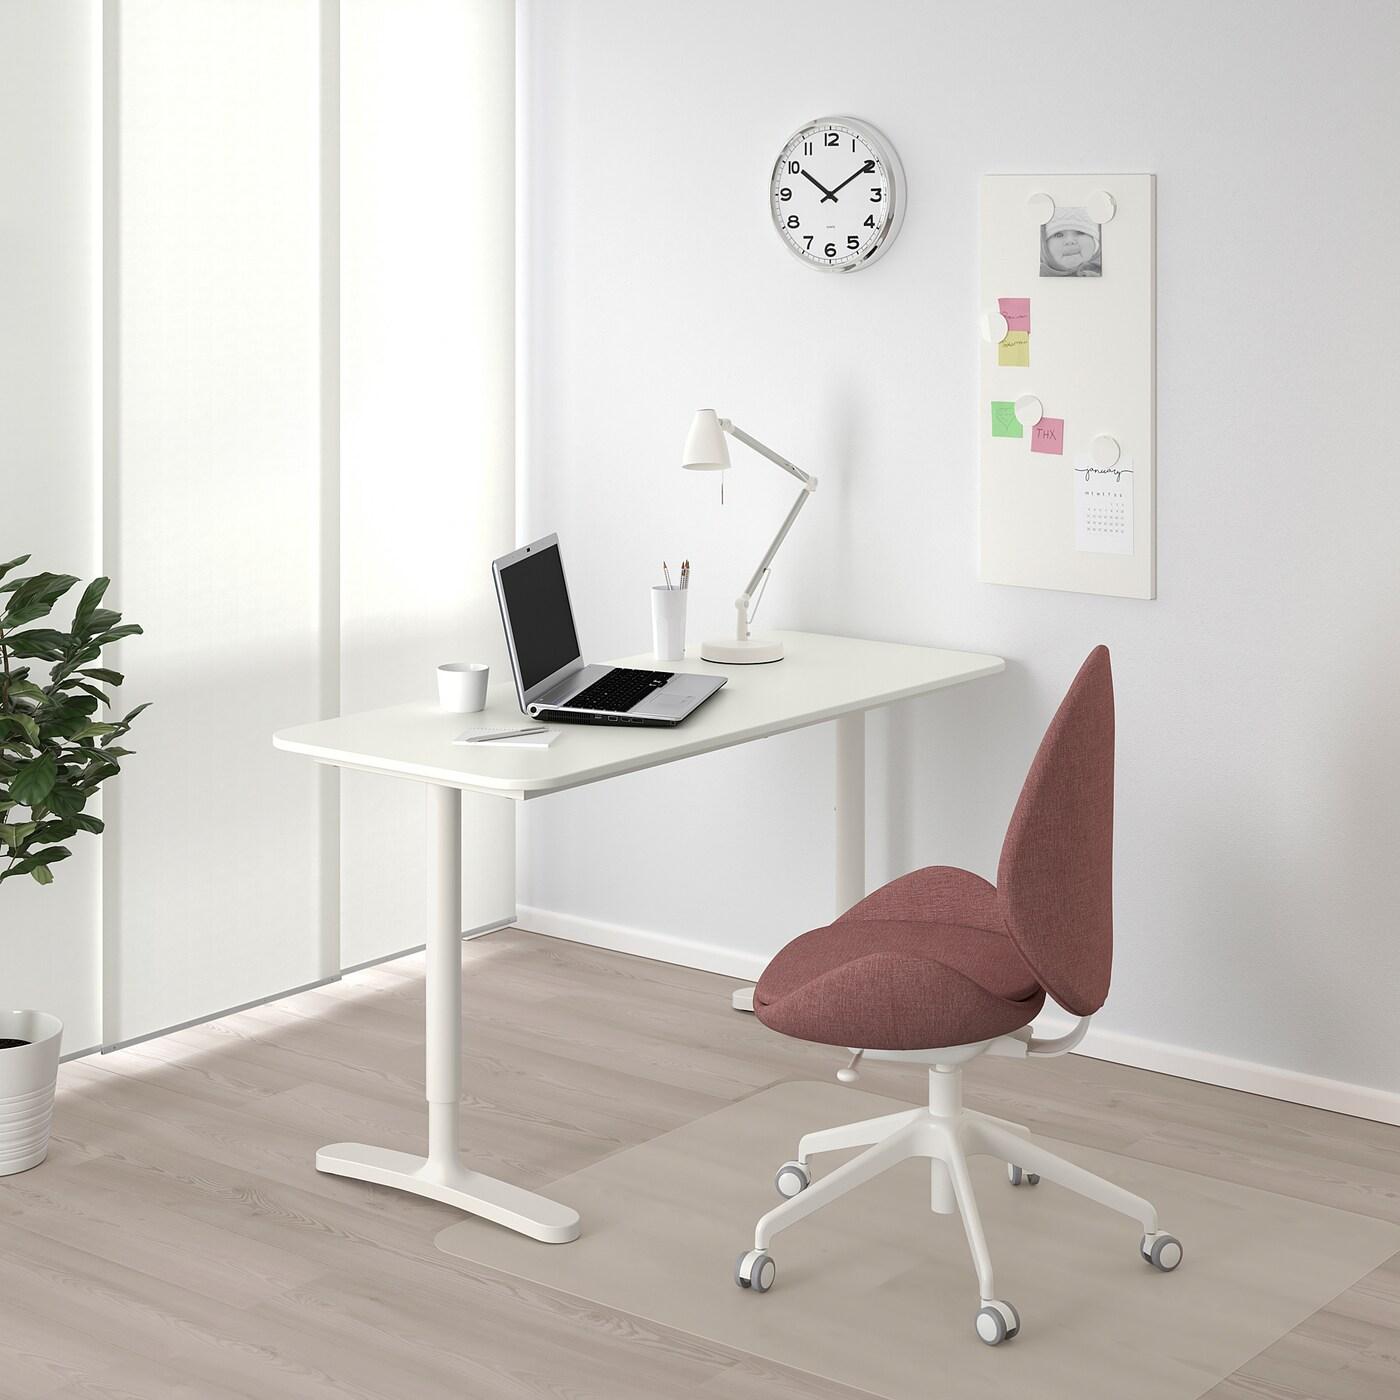 BEKANT Desk, white, 140x60 cm